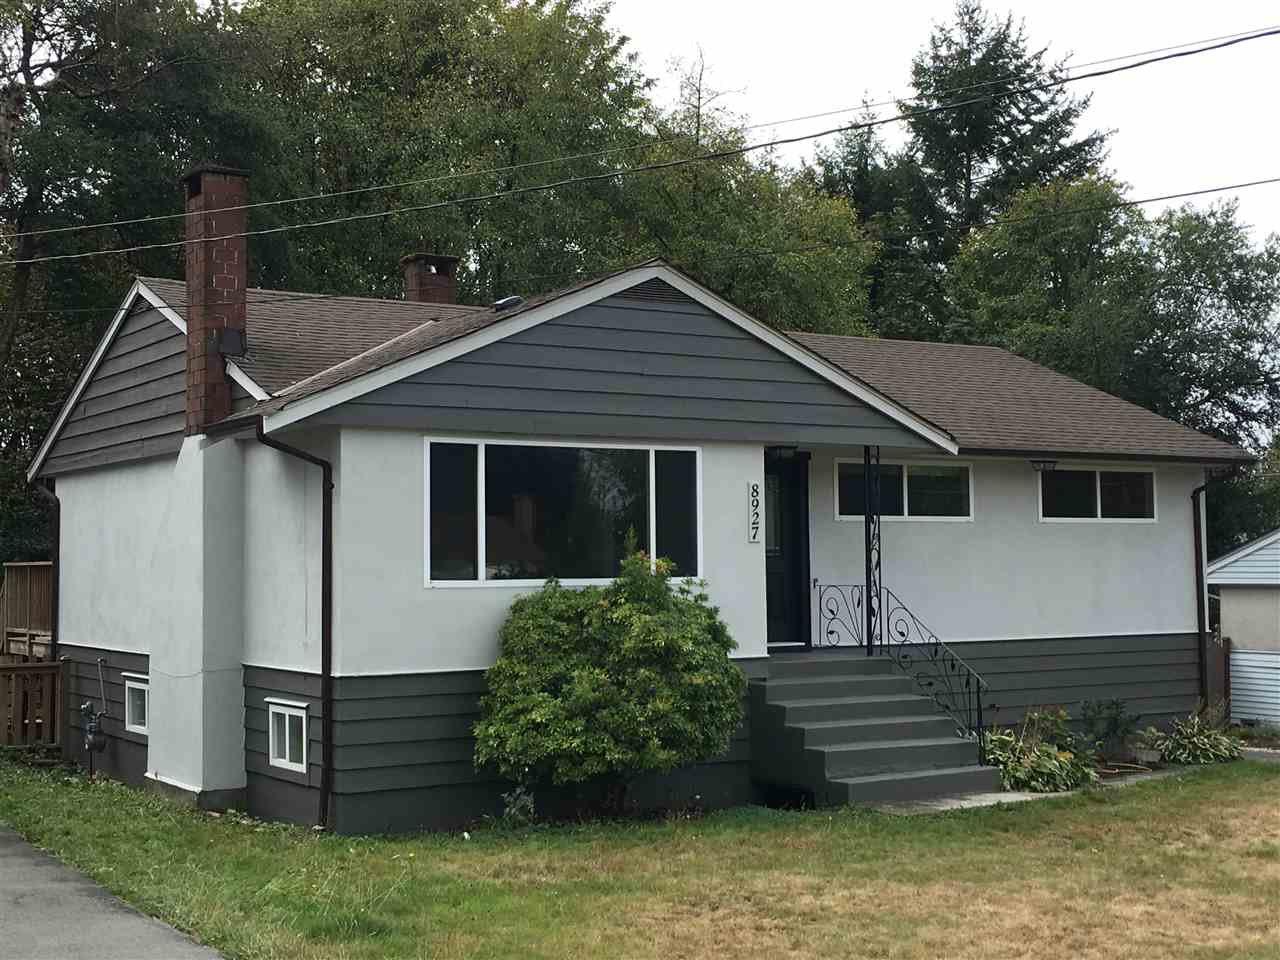 Main Photo: 8927 SHEPHERD Way in Delta: Nordel House for sale (N. Delta)  : MLS®# R2107263